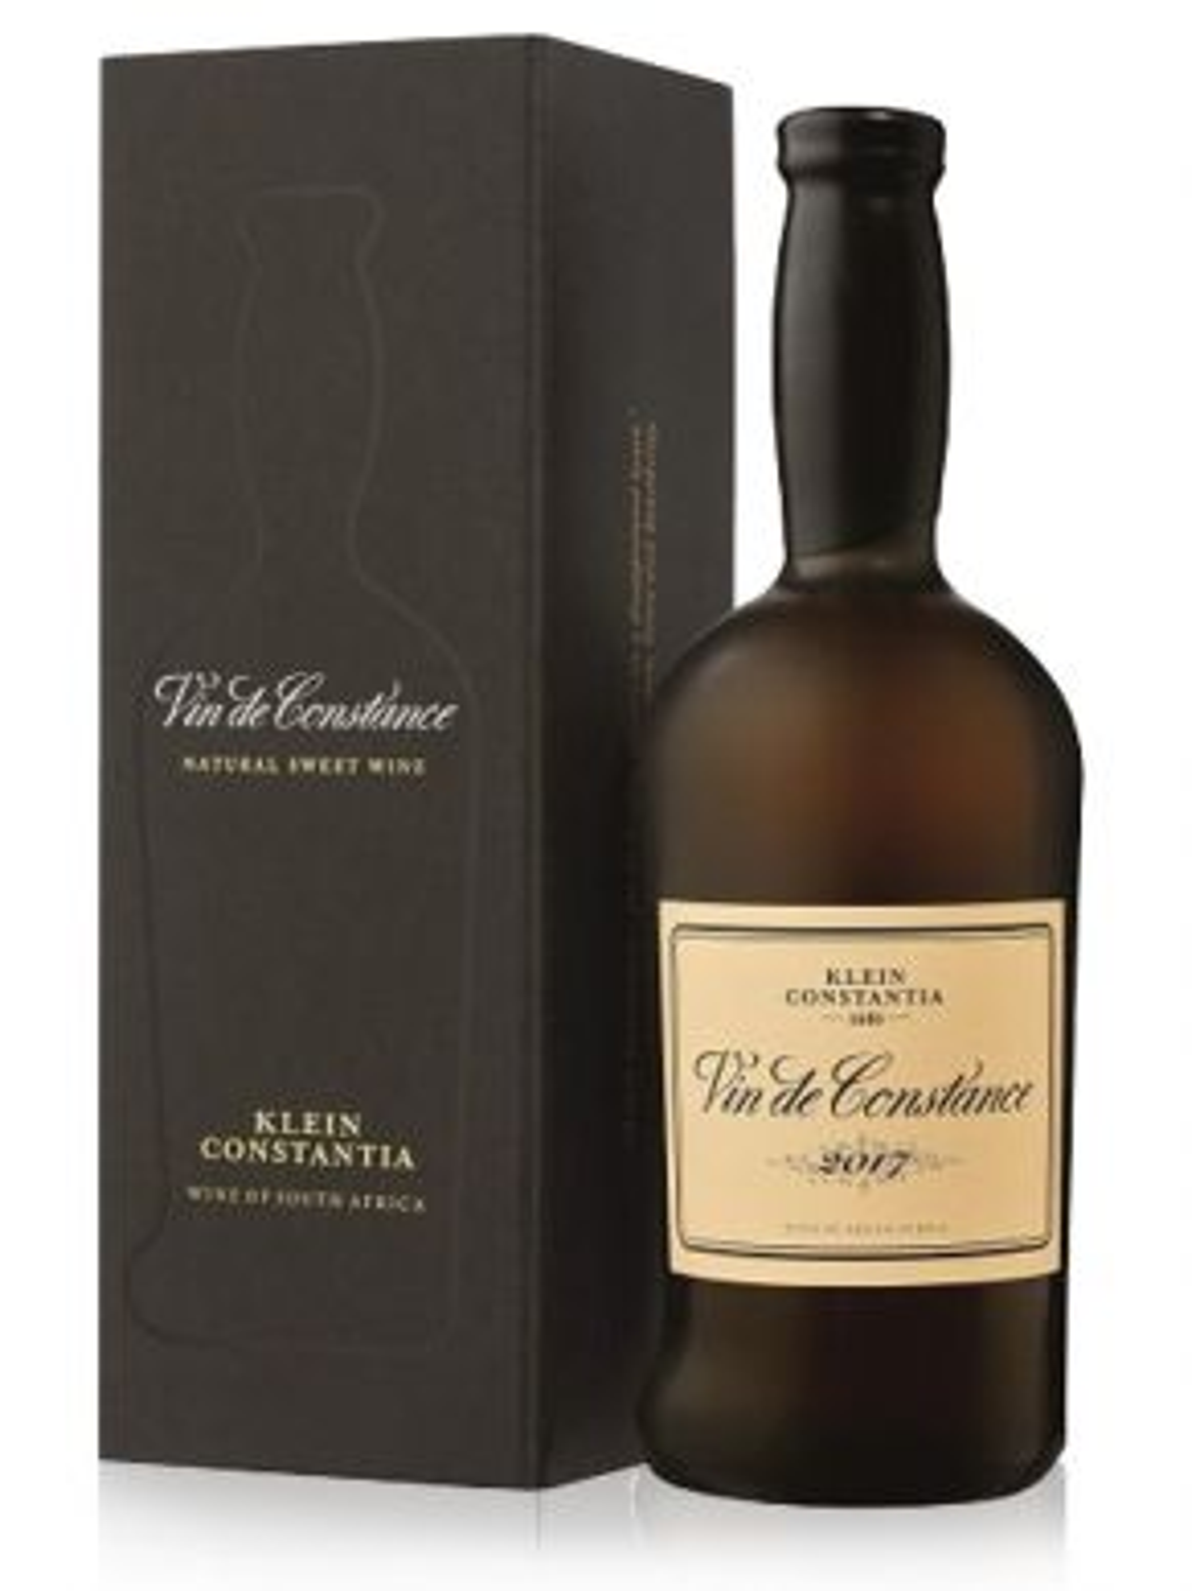 Klein Constantia Vin de Constance 2013 Natural Sweet Wine 50cl